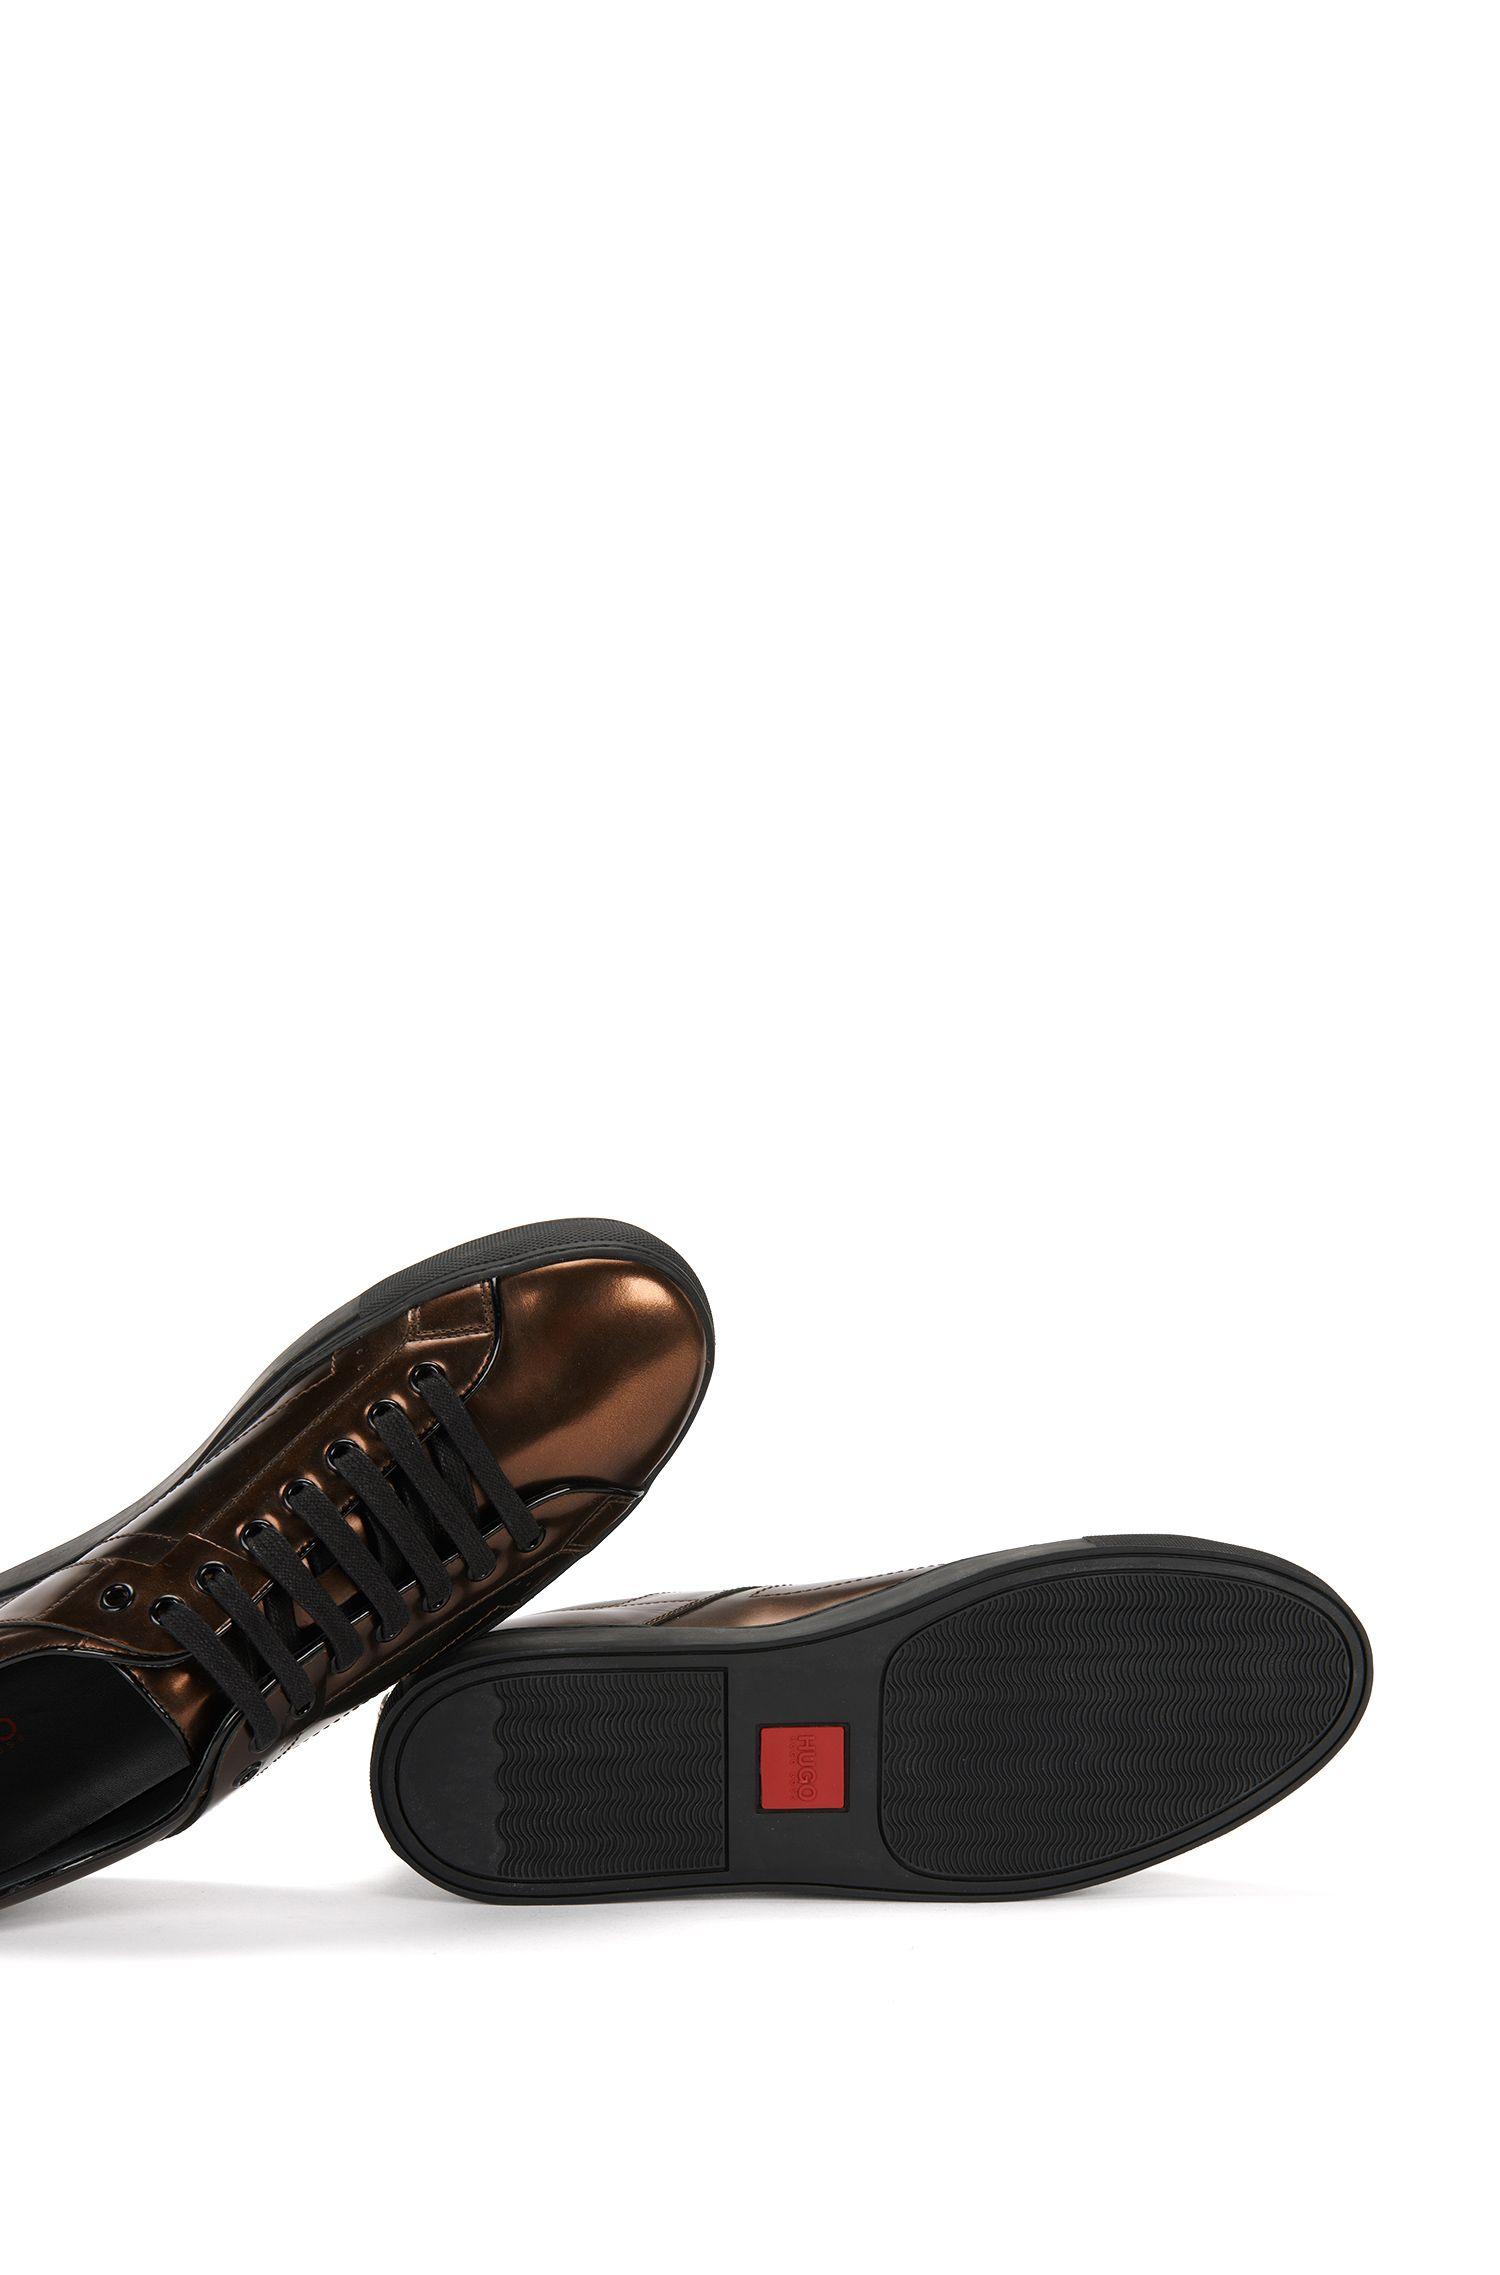 Sneakers aus Leder in Metallic-Optik: 'Futurism_Tenn_ltmt'